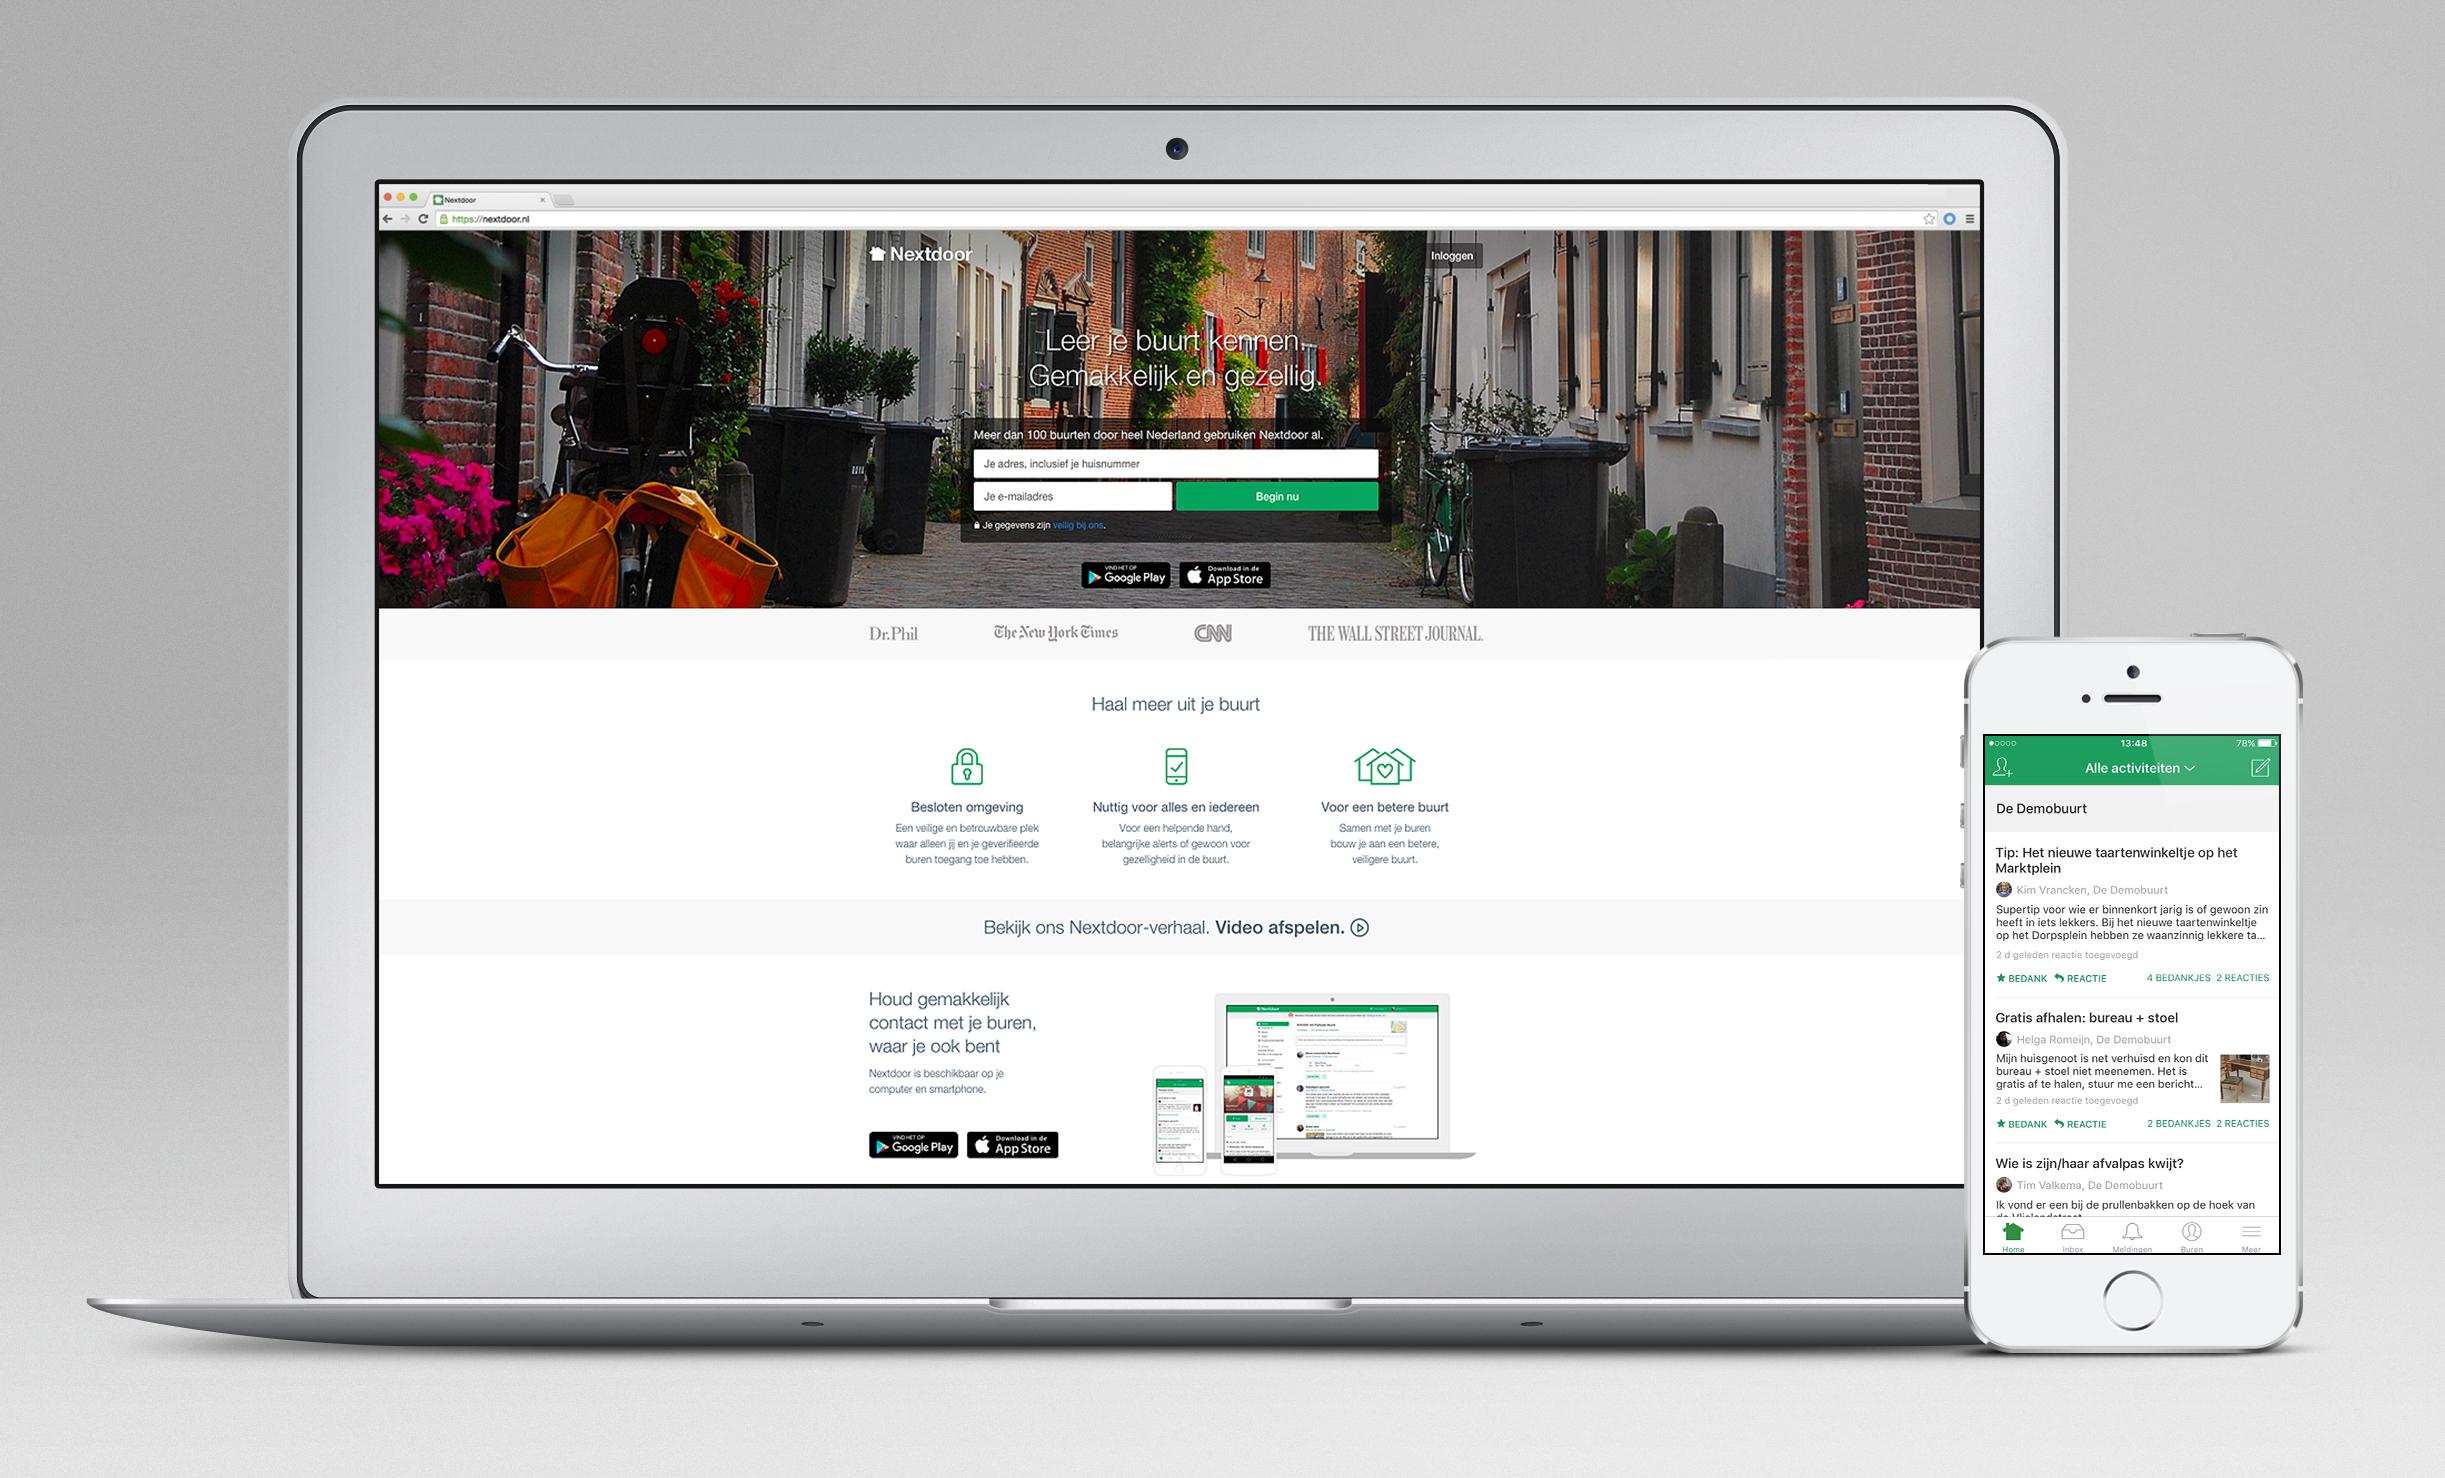 Social networking site Nextdoor launches its neighborhood service in the Netherlands.